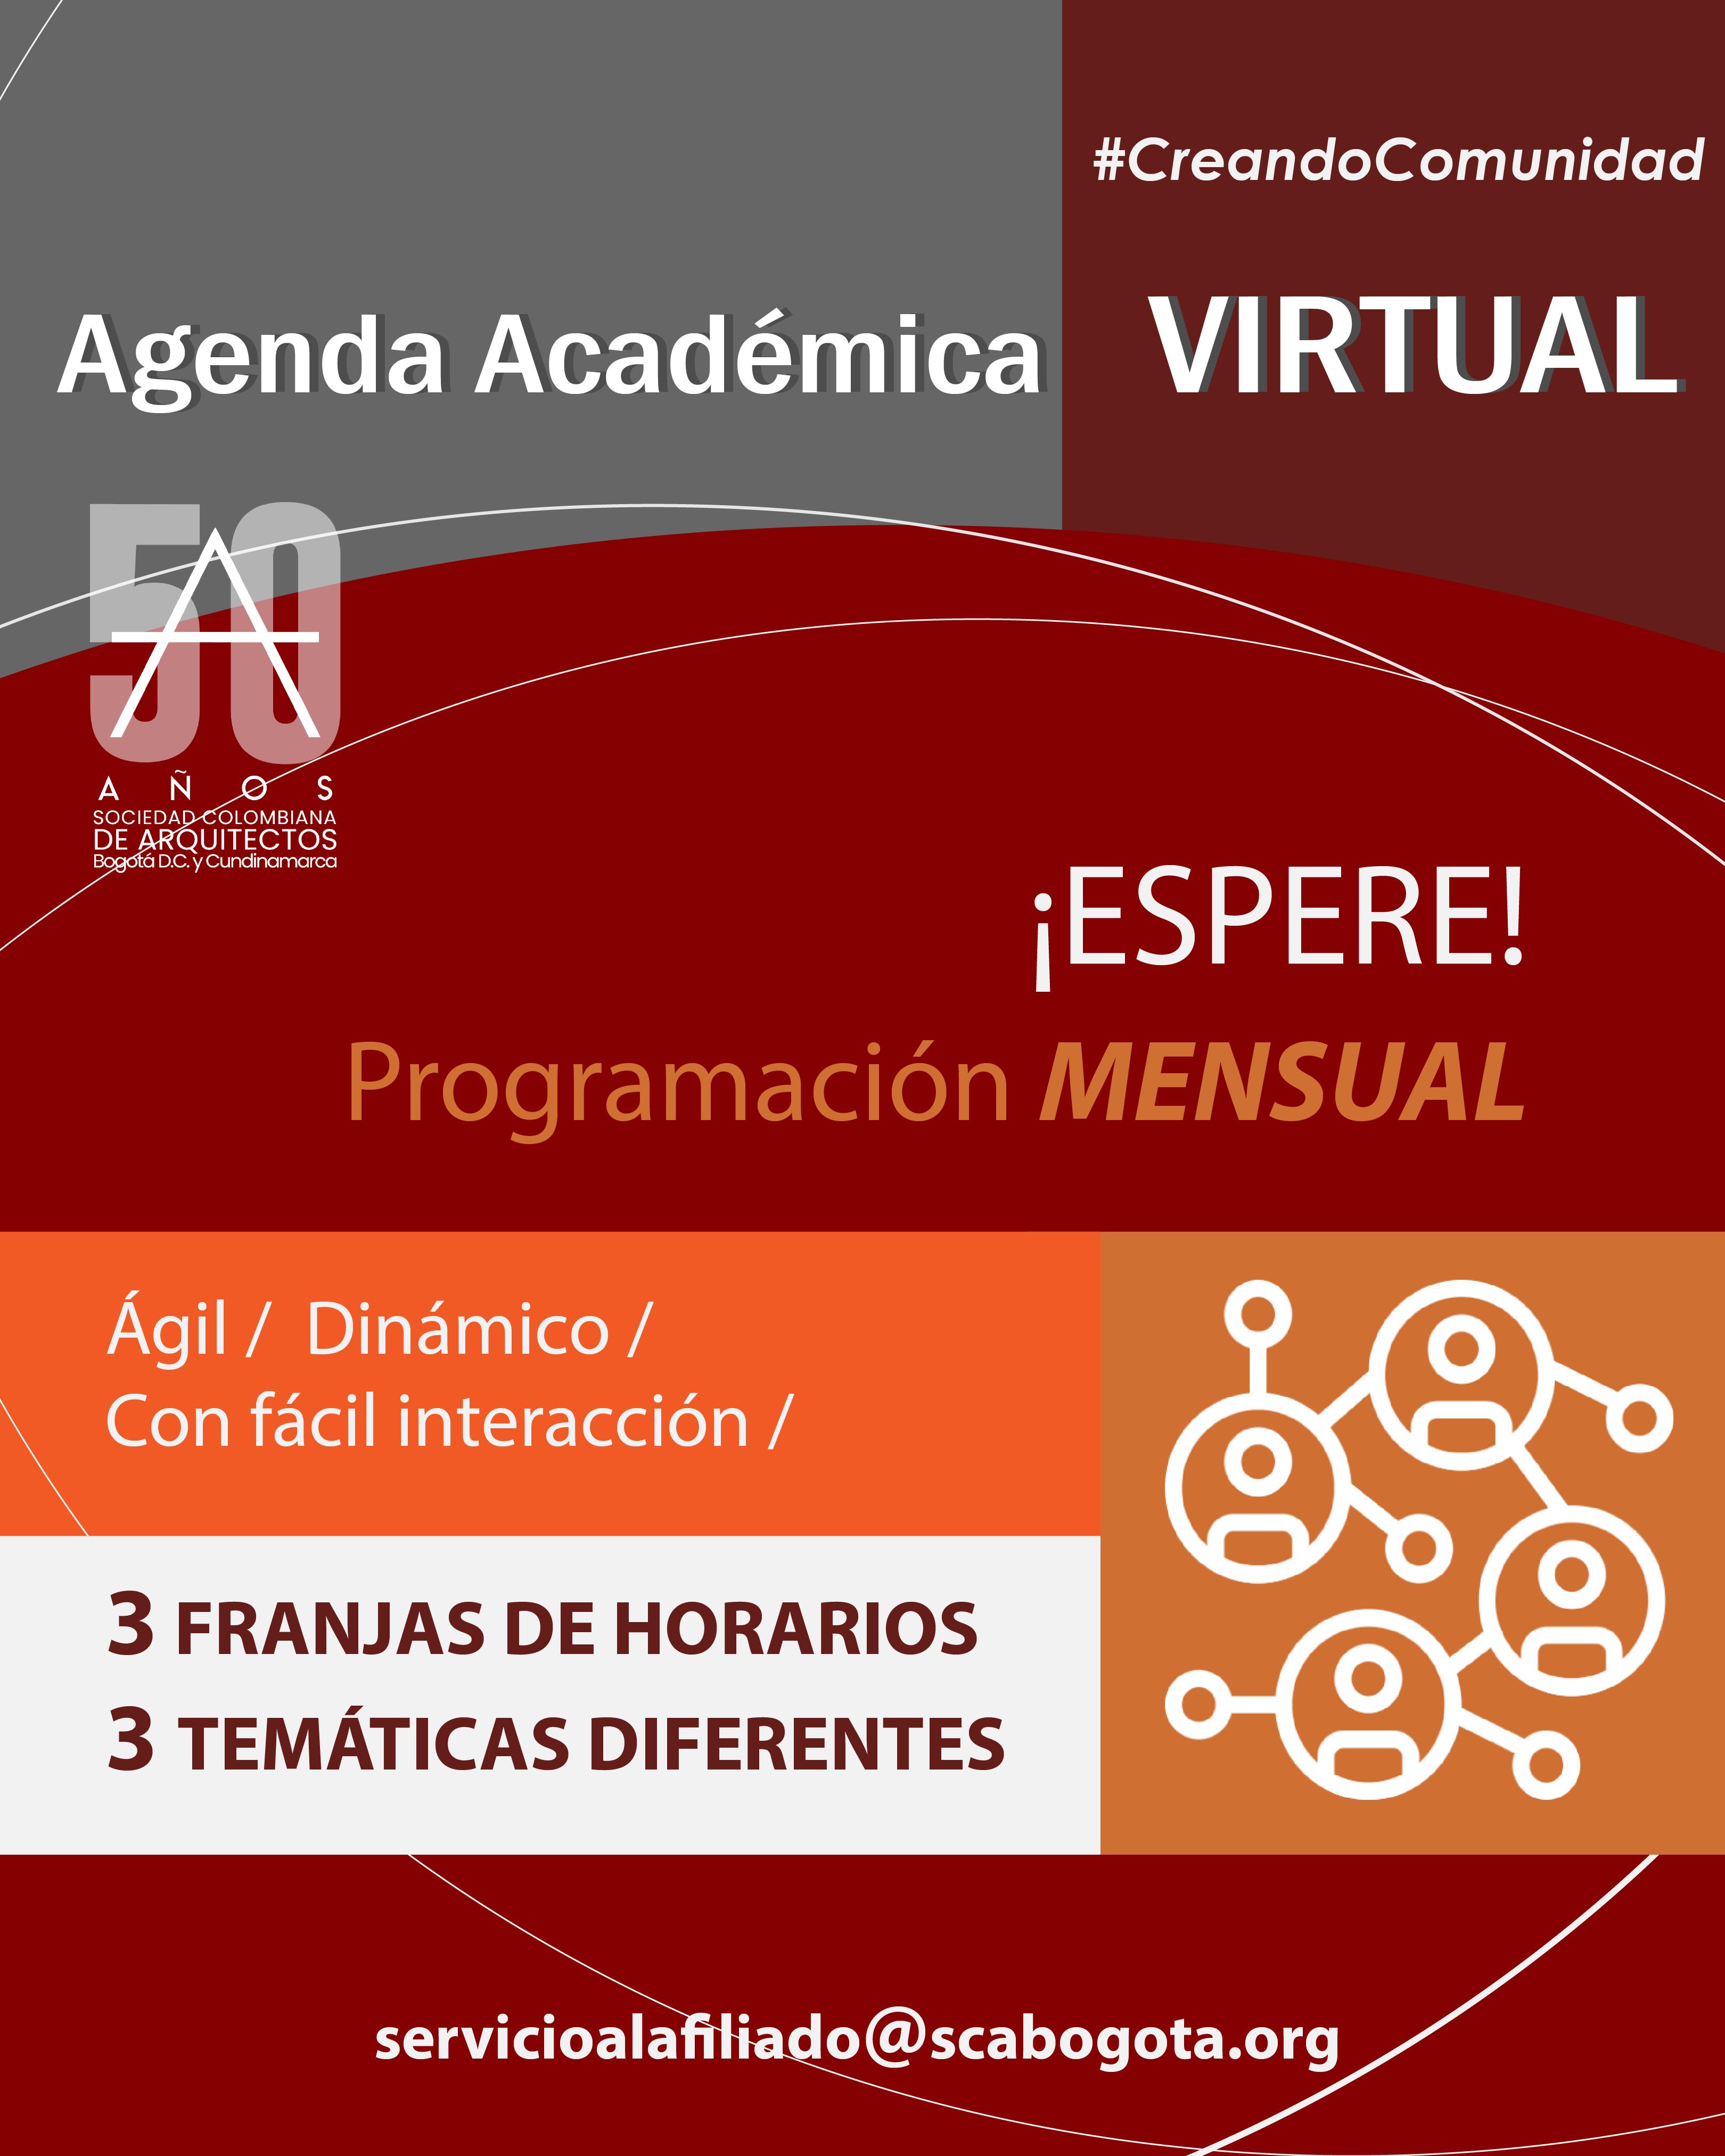 http://scabogota.org/2020/04/16/agenda-virtual-sca-bc/